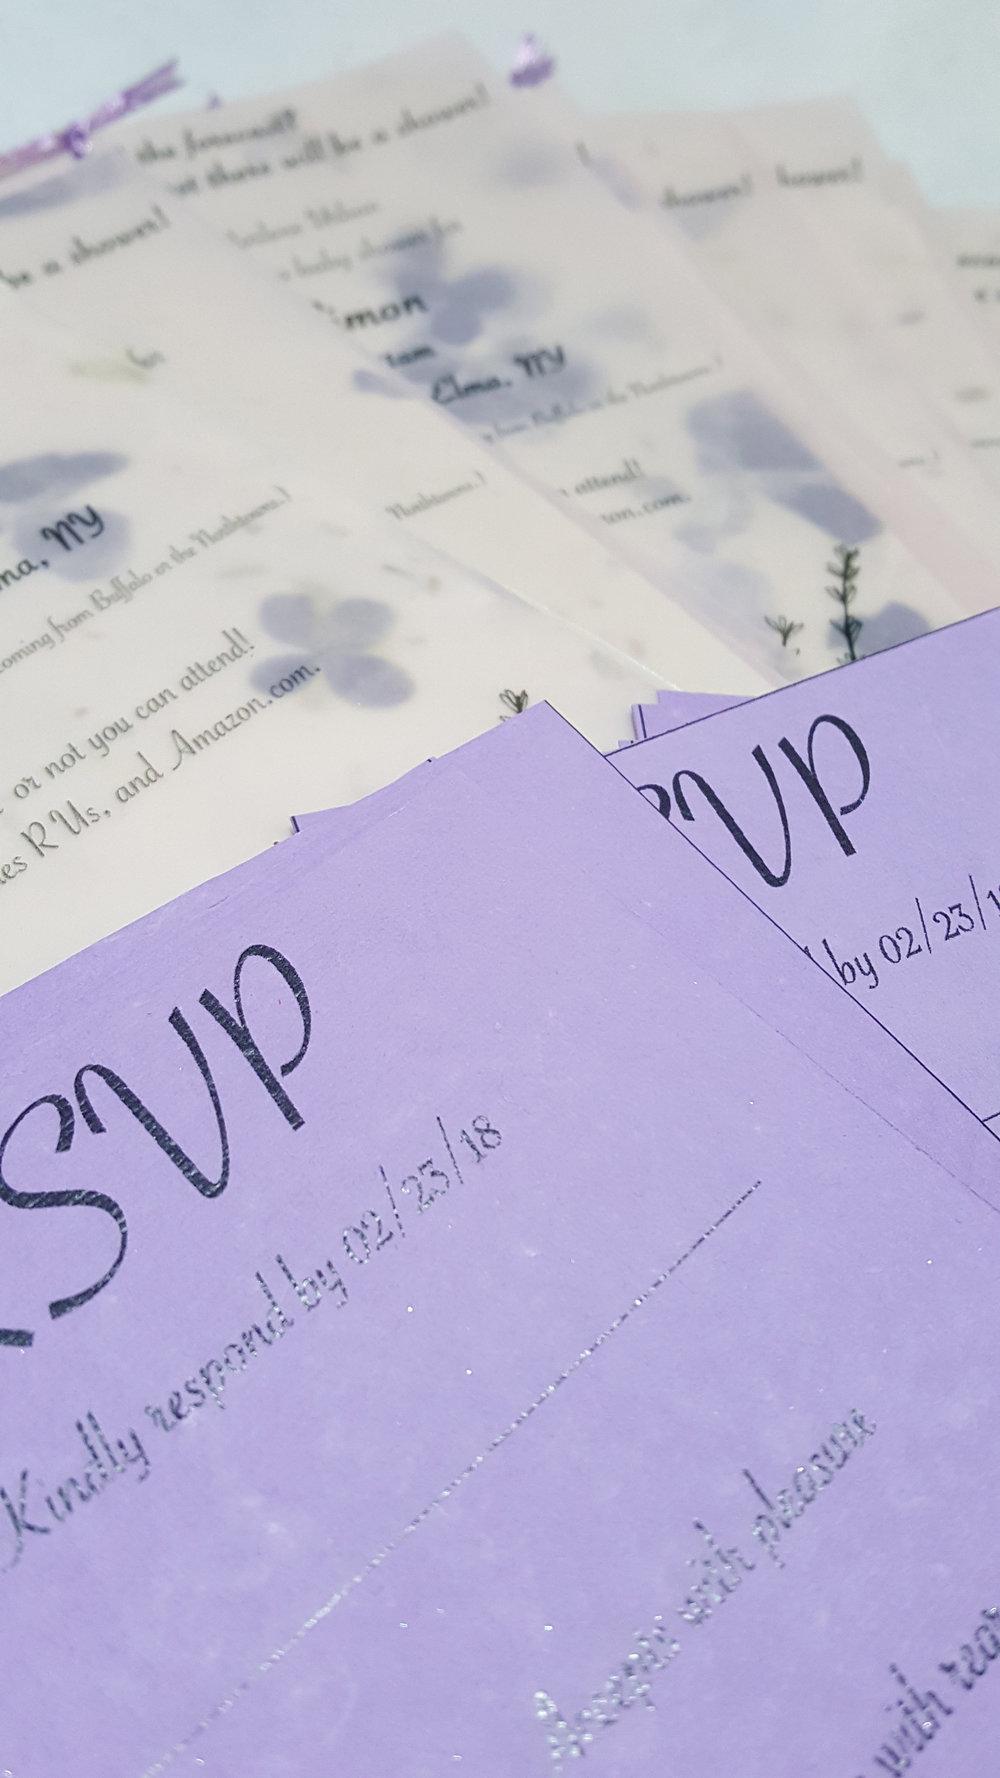 RSVP details invitations